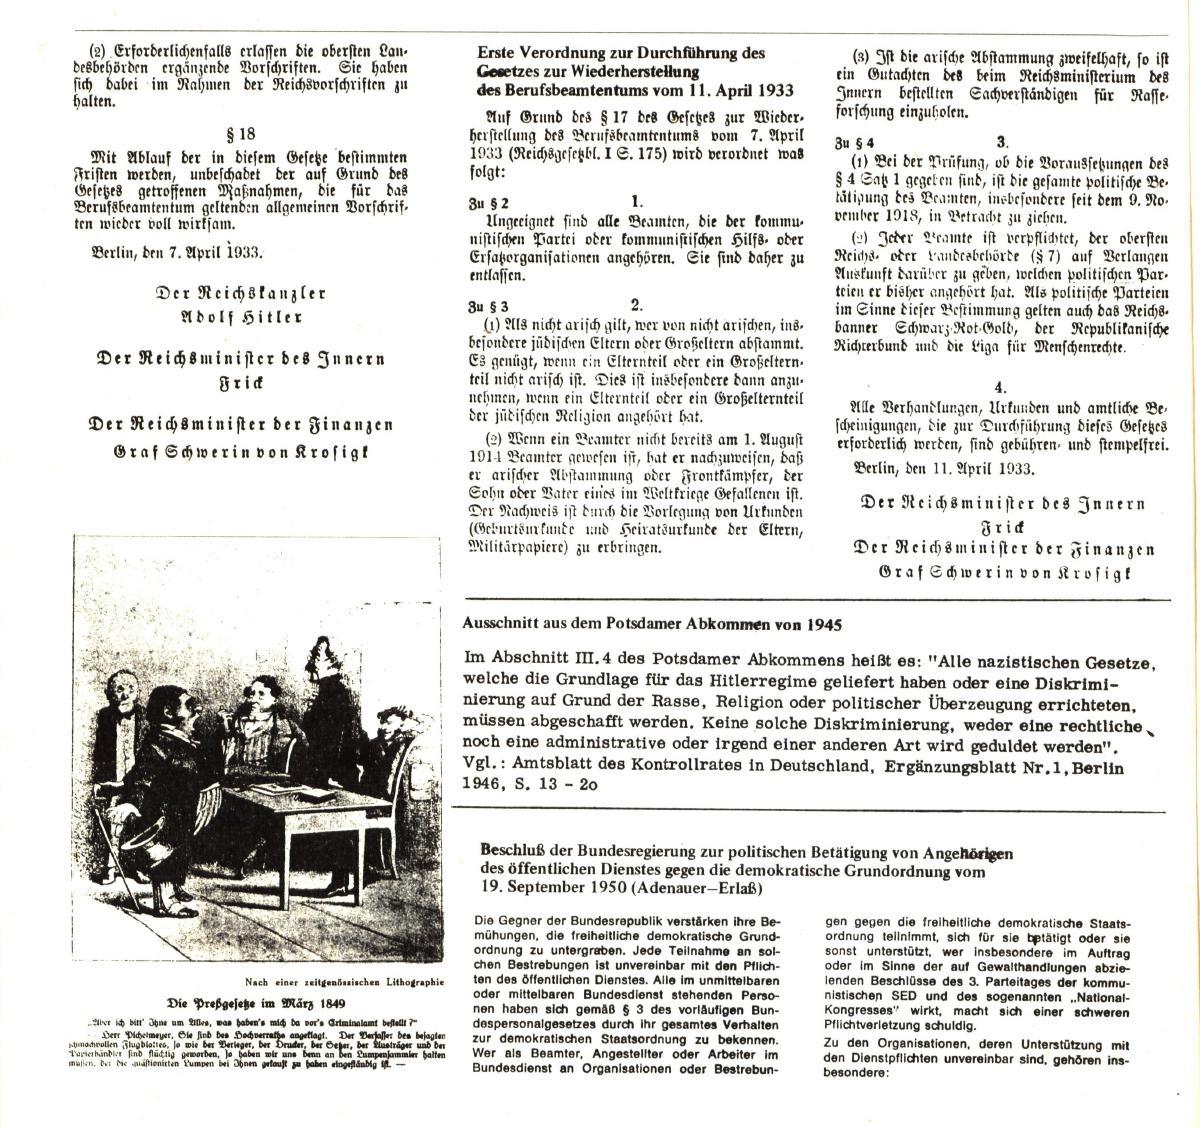 REP_VLB_1976_Die_Zensurgesetze_41